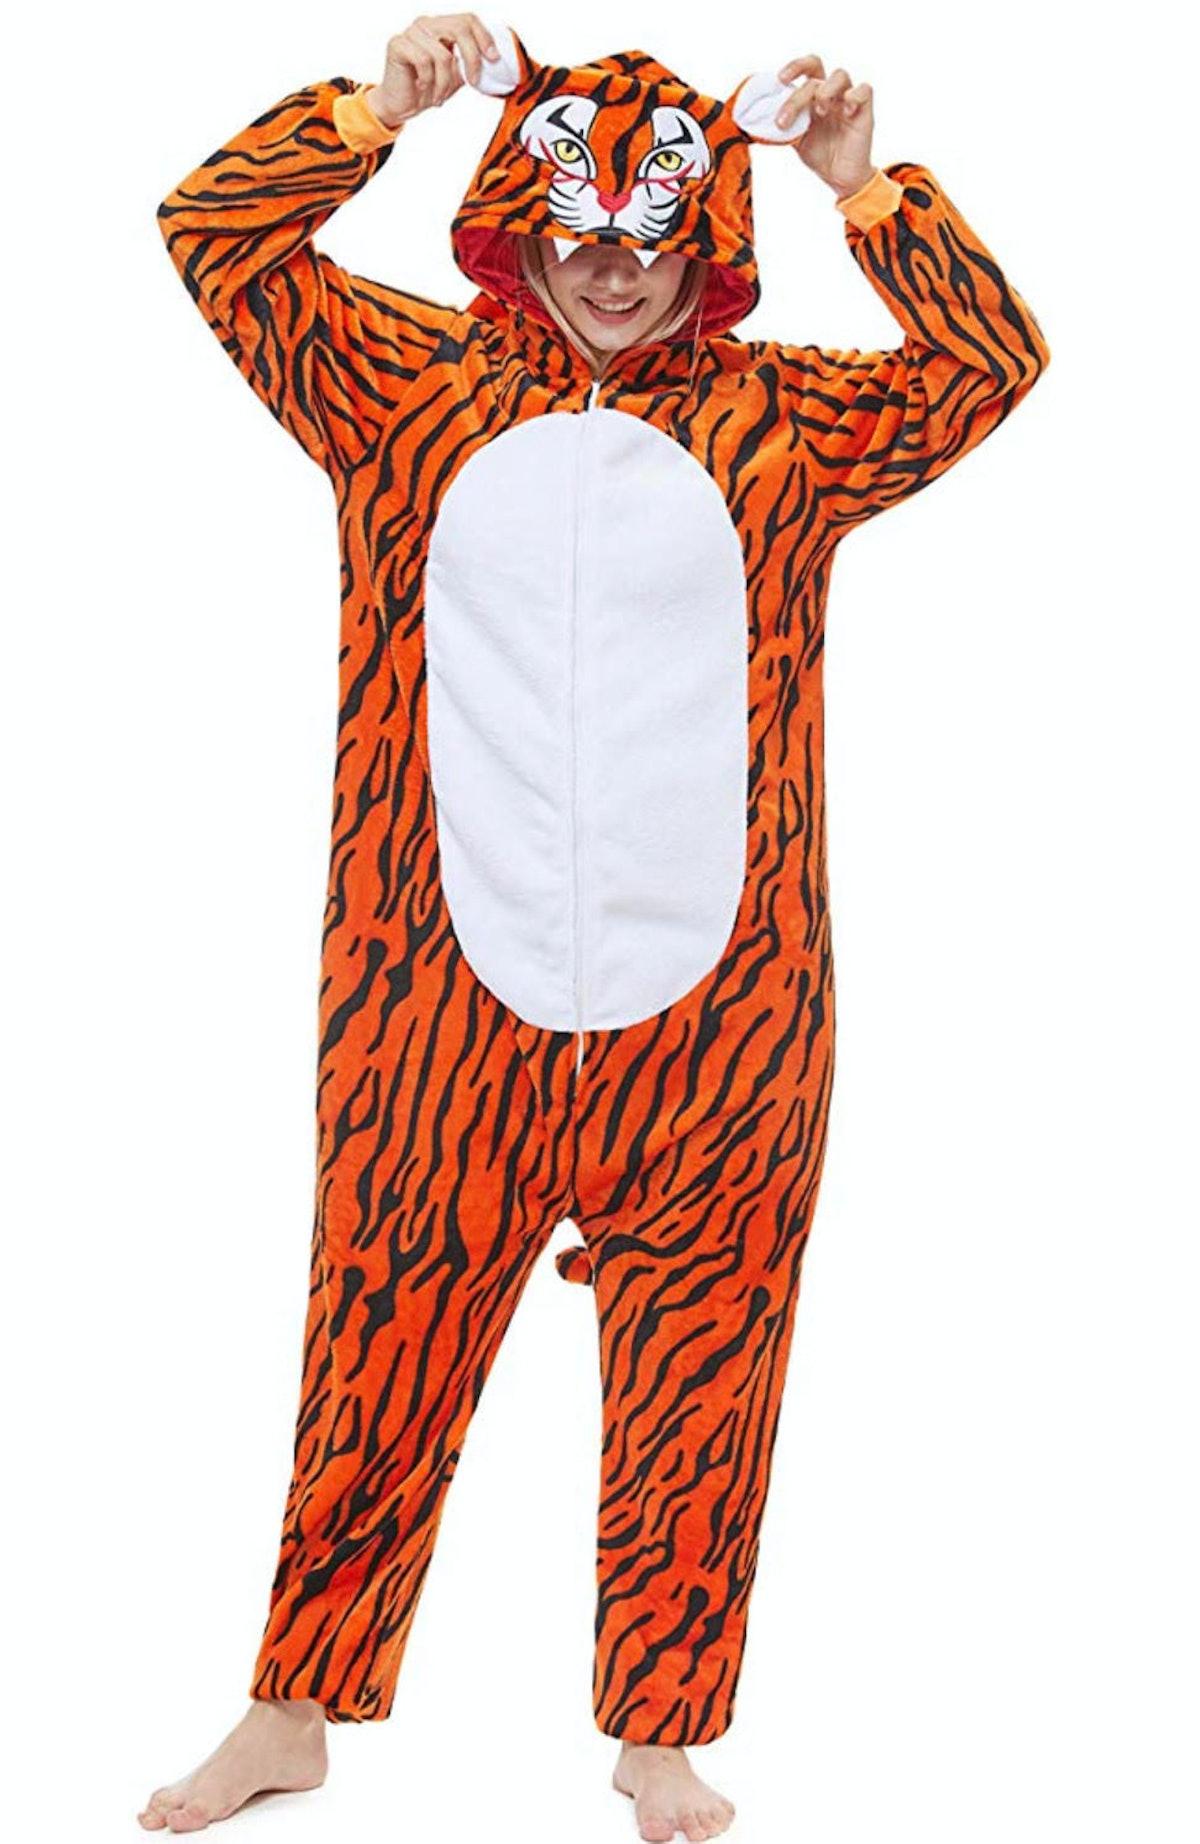 Yutown New Adult Animal Costume Onesie